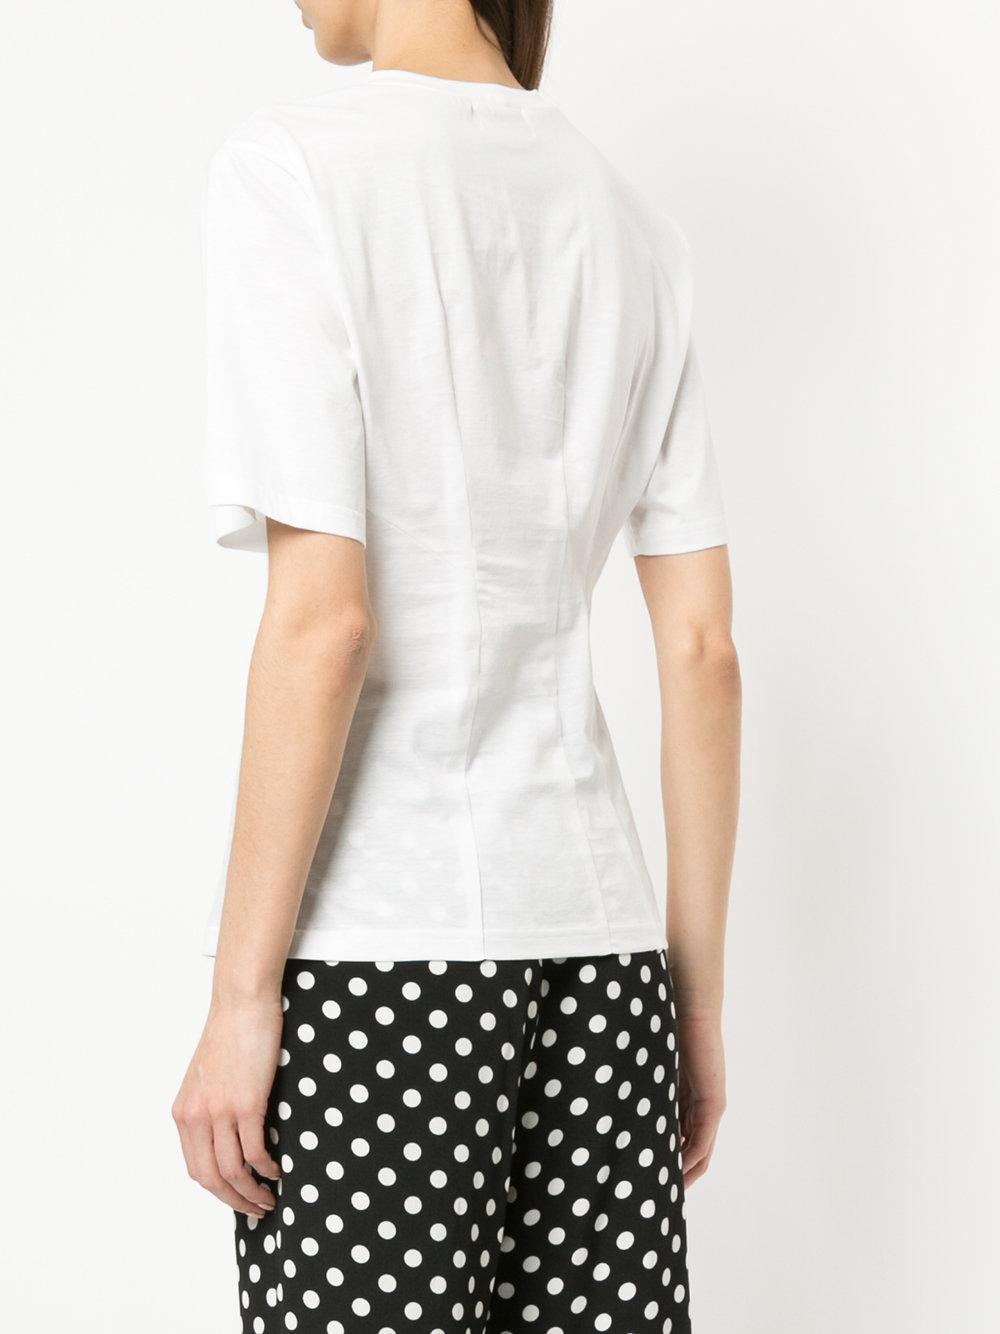 G.V.G.V. round neck T-shirt From China Sale Online 2018 New Online Z2YIt2Y